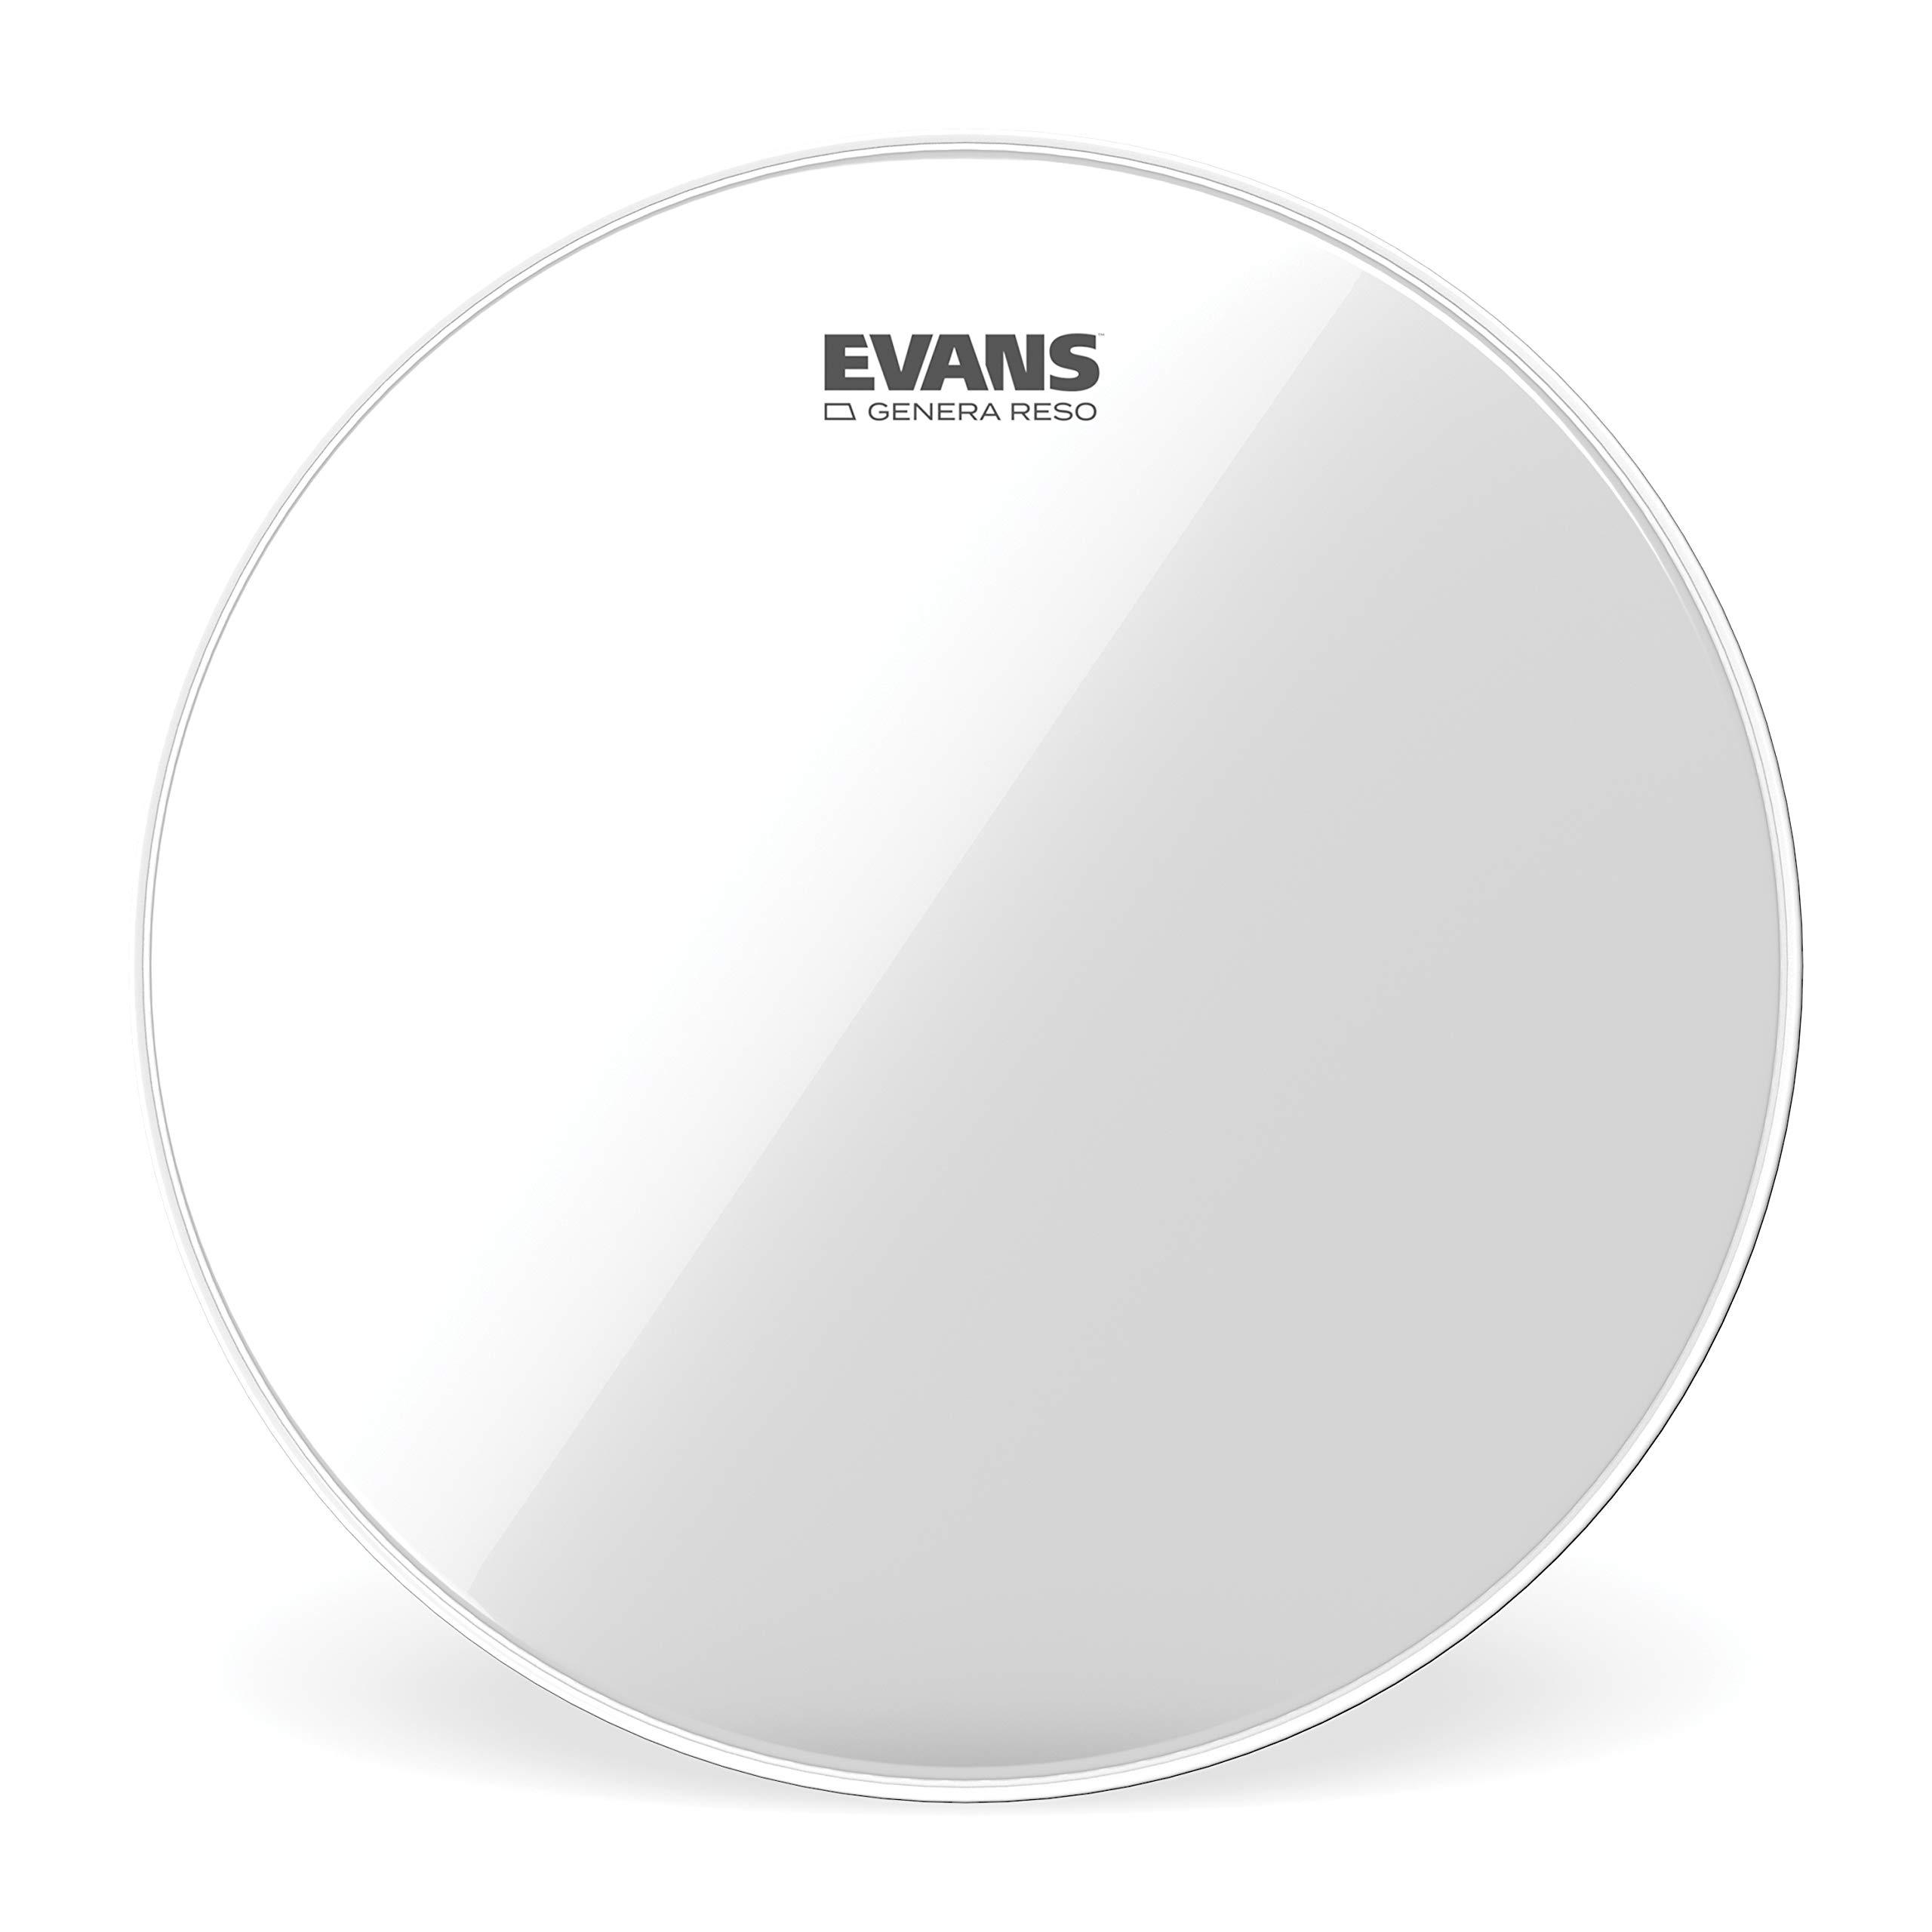 Evans Genera Resonant Drum Head, 18 Inch by Evans